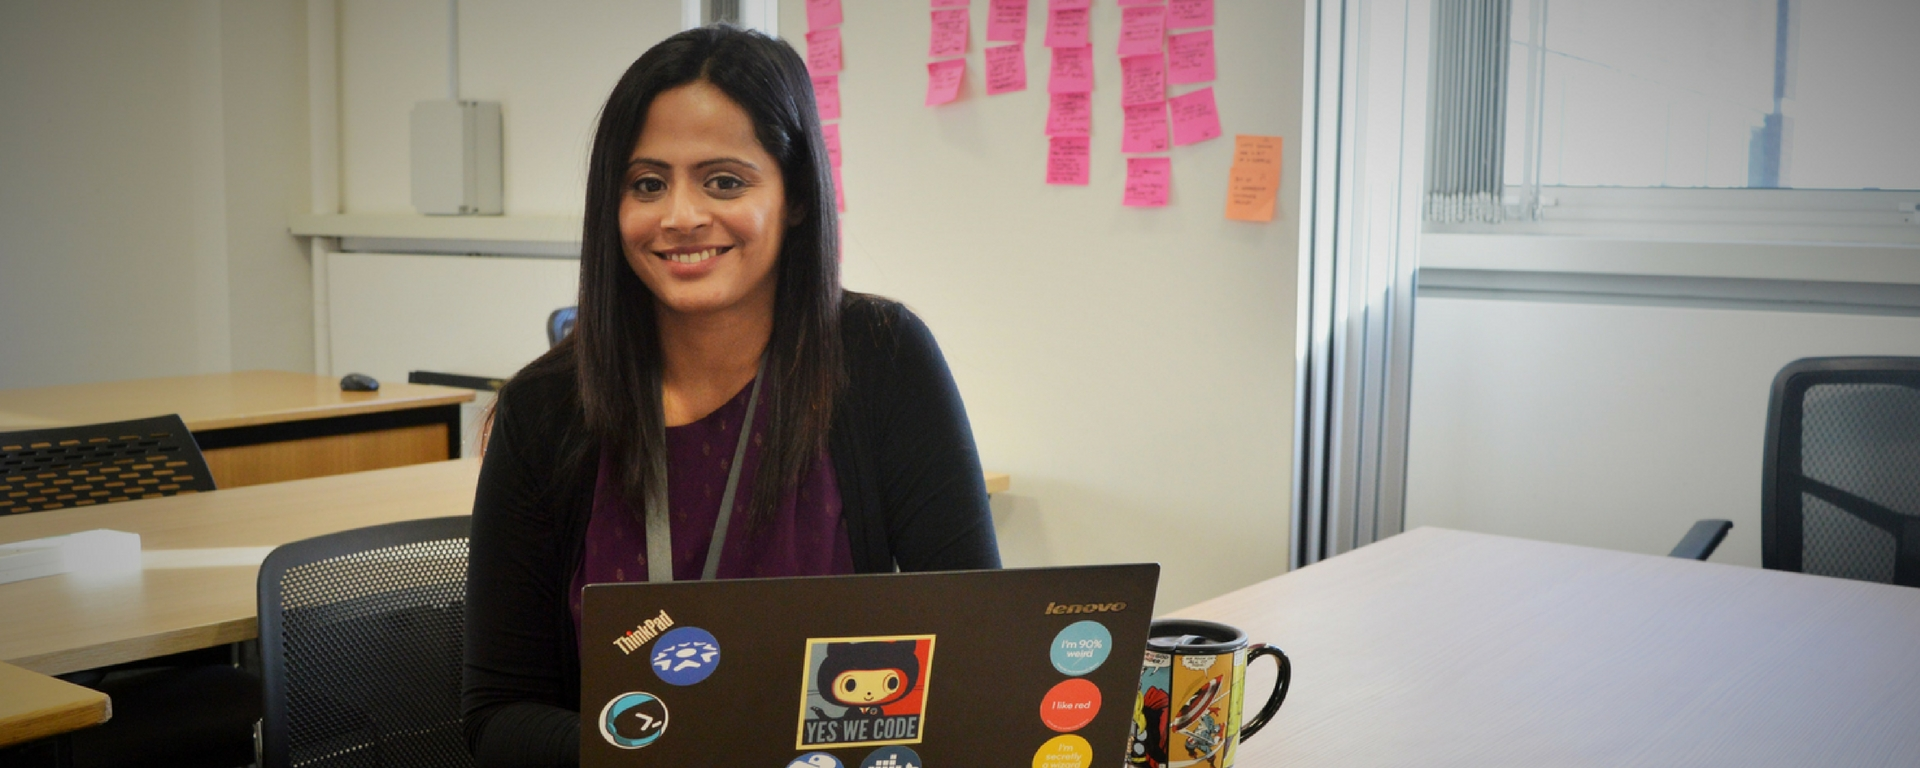 Jo Mahadevan at desk with laptop